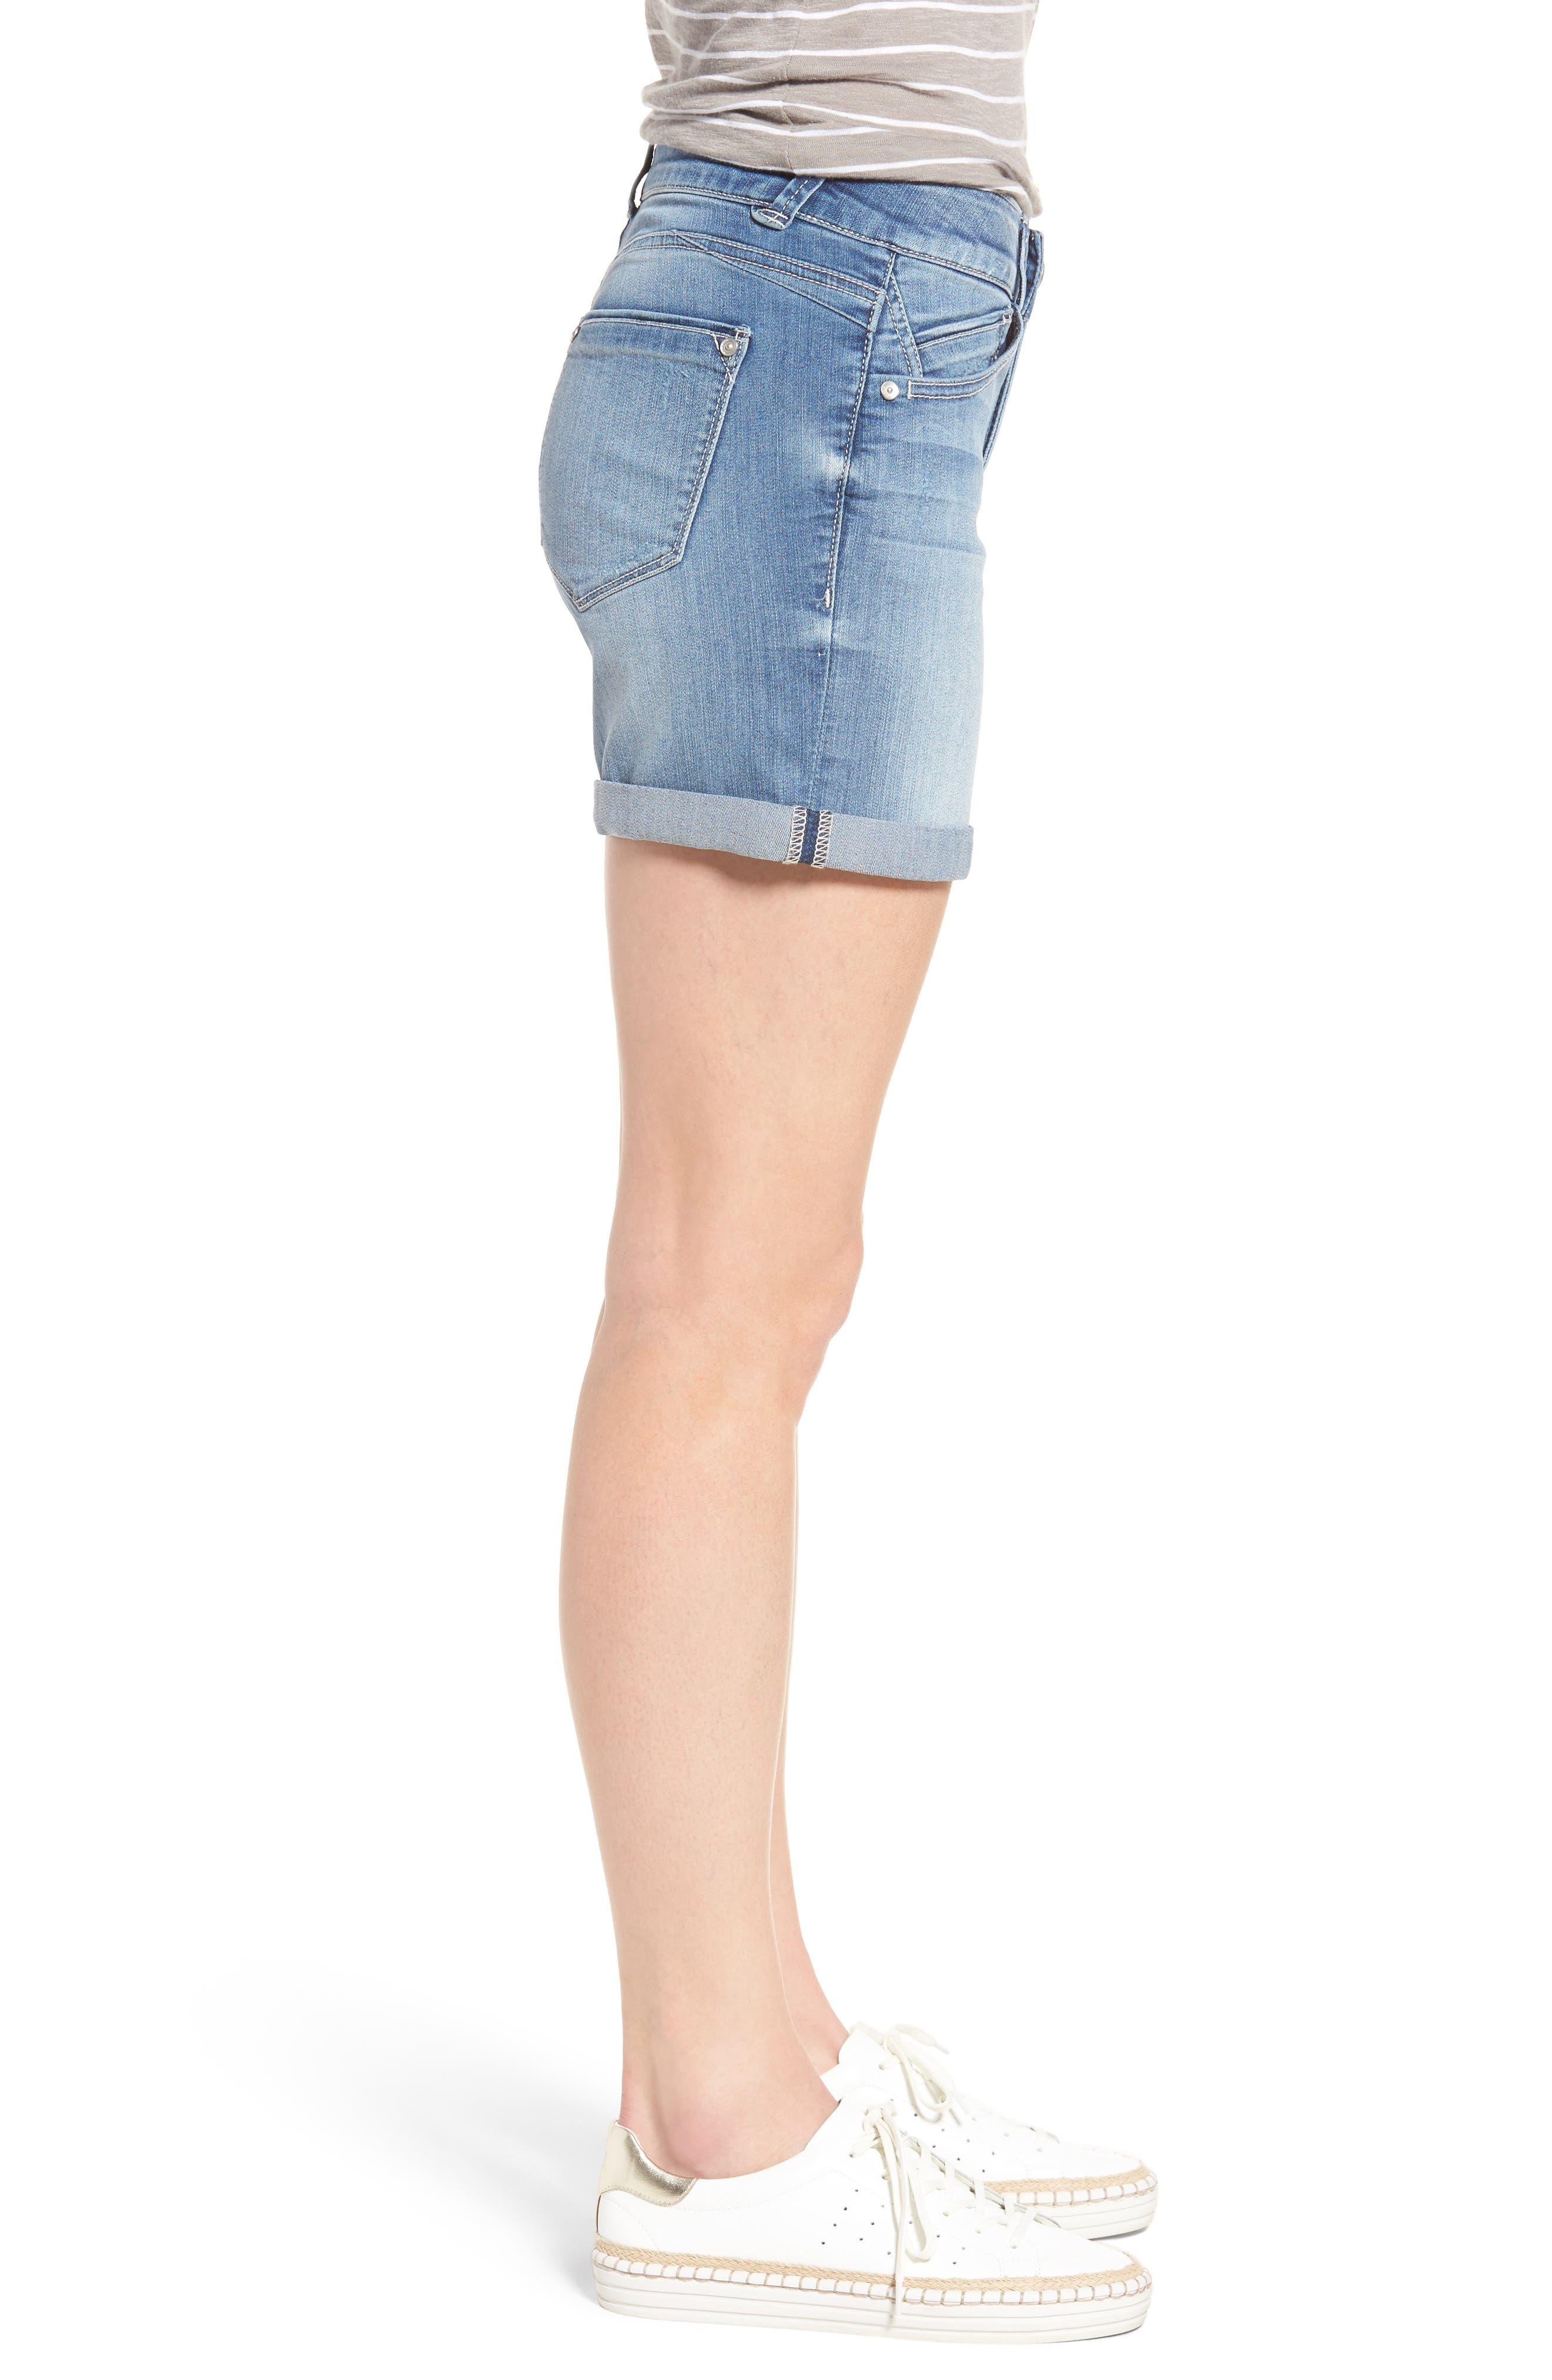 Alternate Image 3  - Wit & Wisdom Ab-solution Cuffed Denim Shorts (Regular & Petite) (Nordstrom Exclusive)